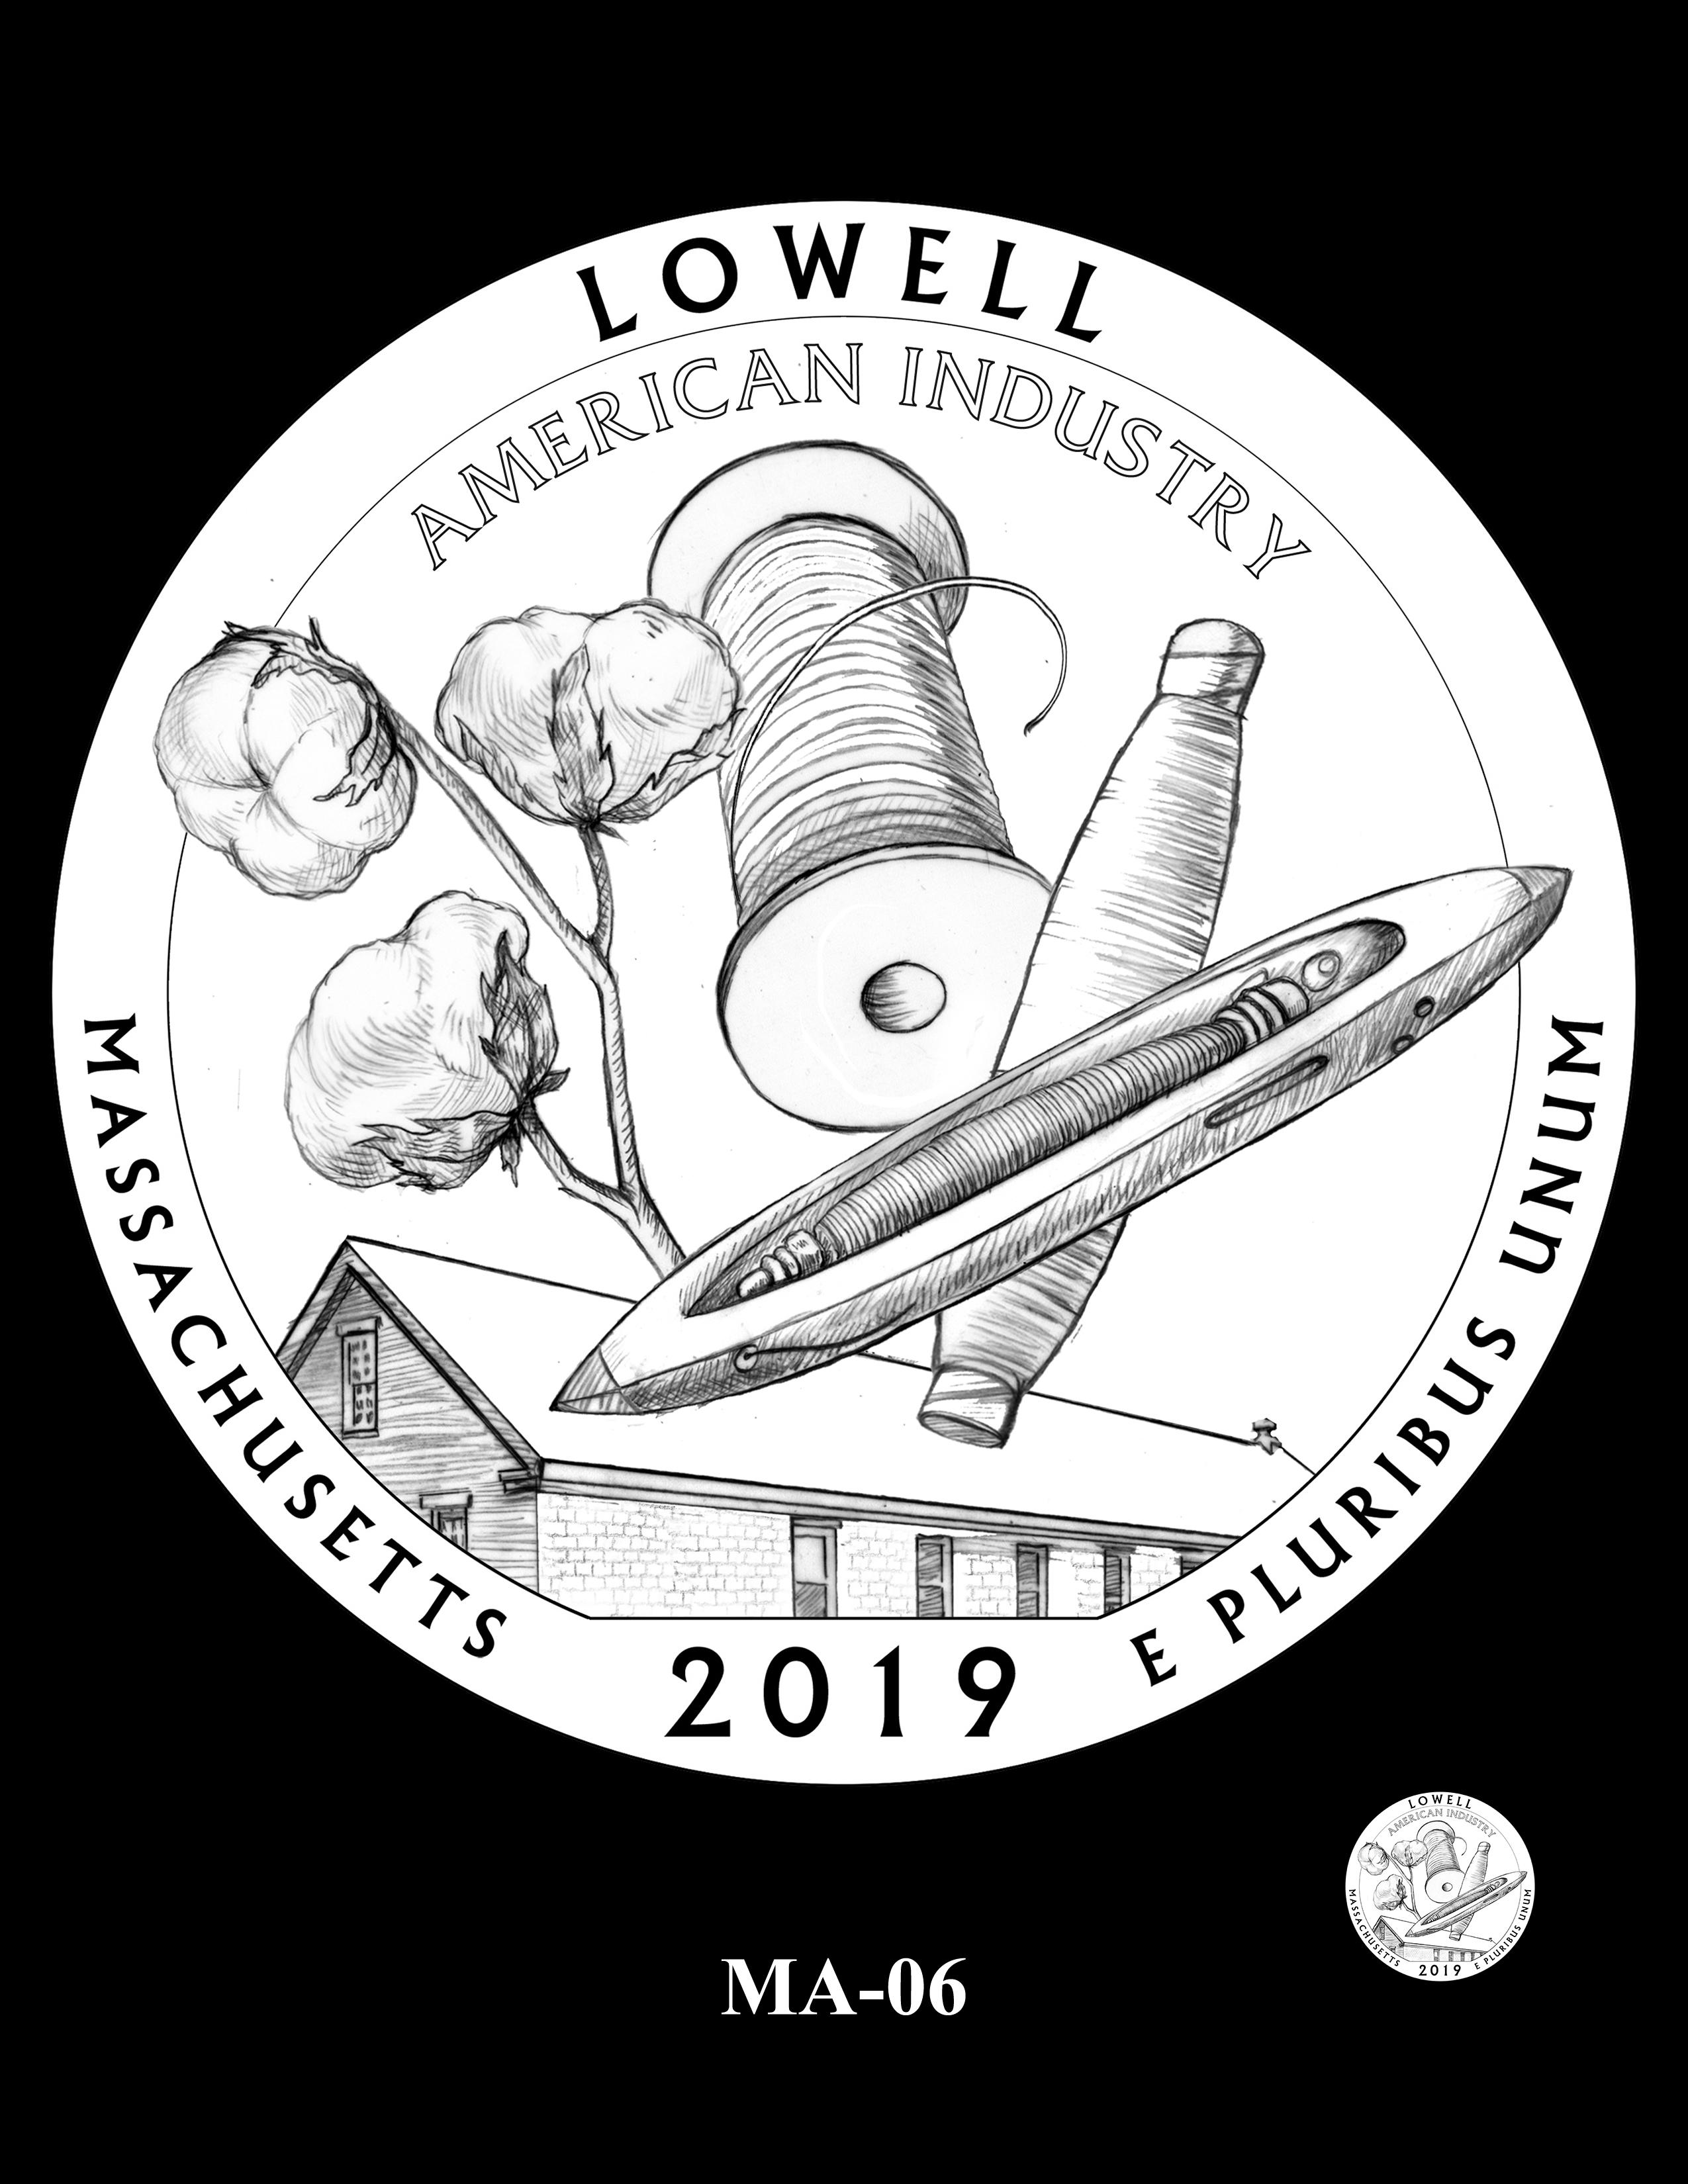 MA-06 -- 2019 America the Beautiful Quarters® Program